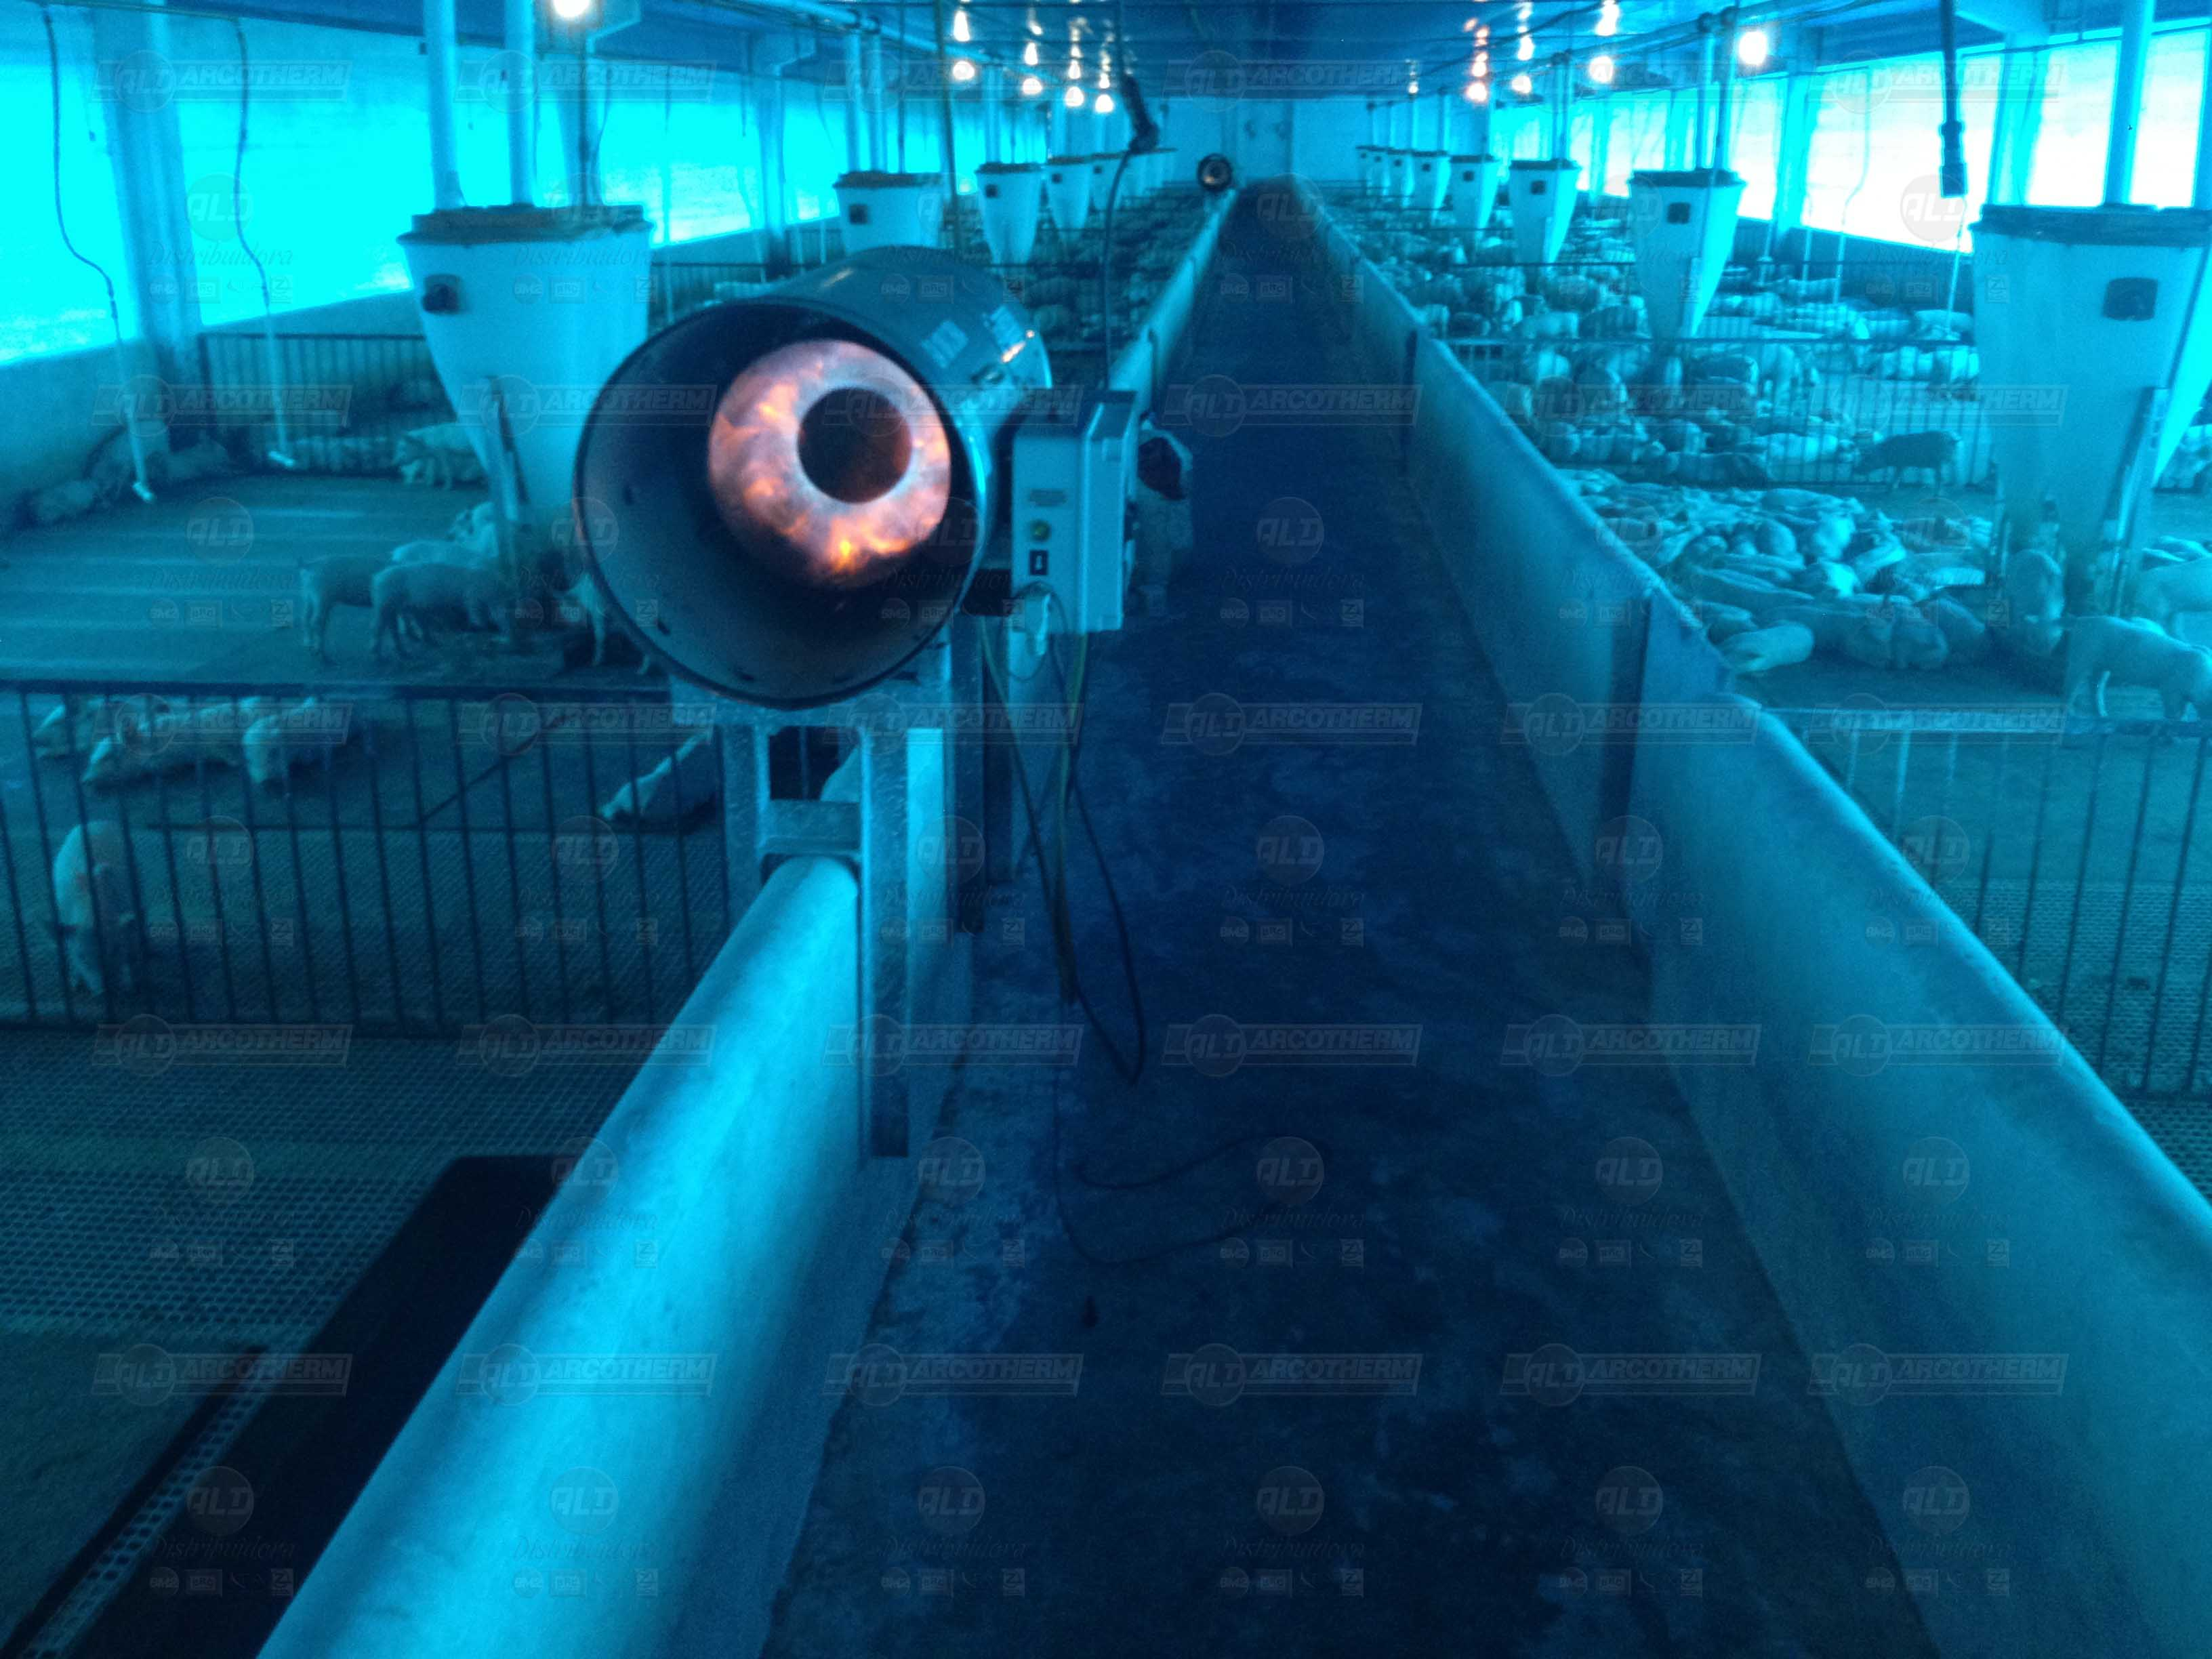 Suinos - galpao recria de leitoes - UPL - aquecedor - gerador de ar quente - arcotherm- 3